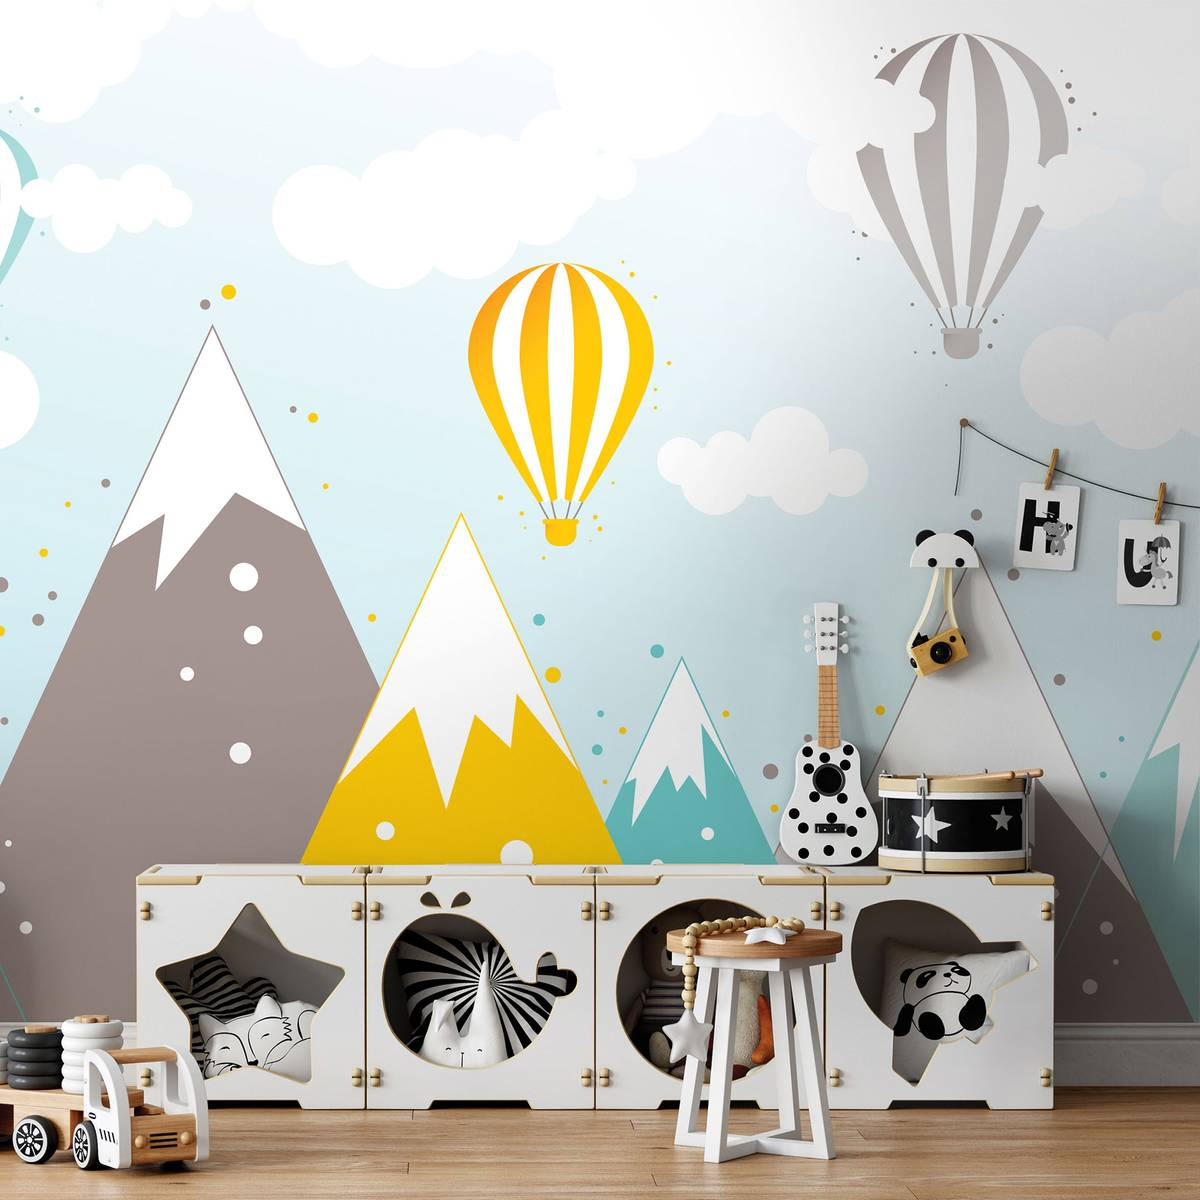 Fototapeta - Hory a teplovzdušné balóny (T032064T254184A)